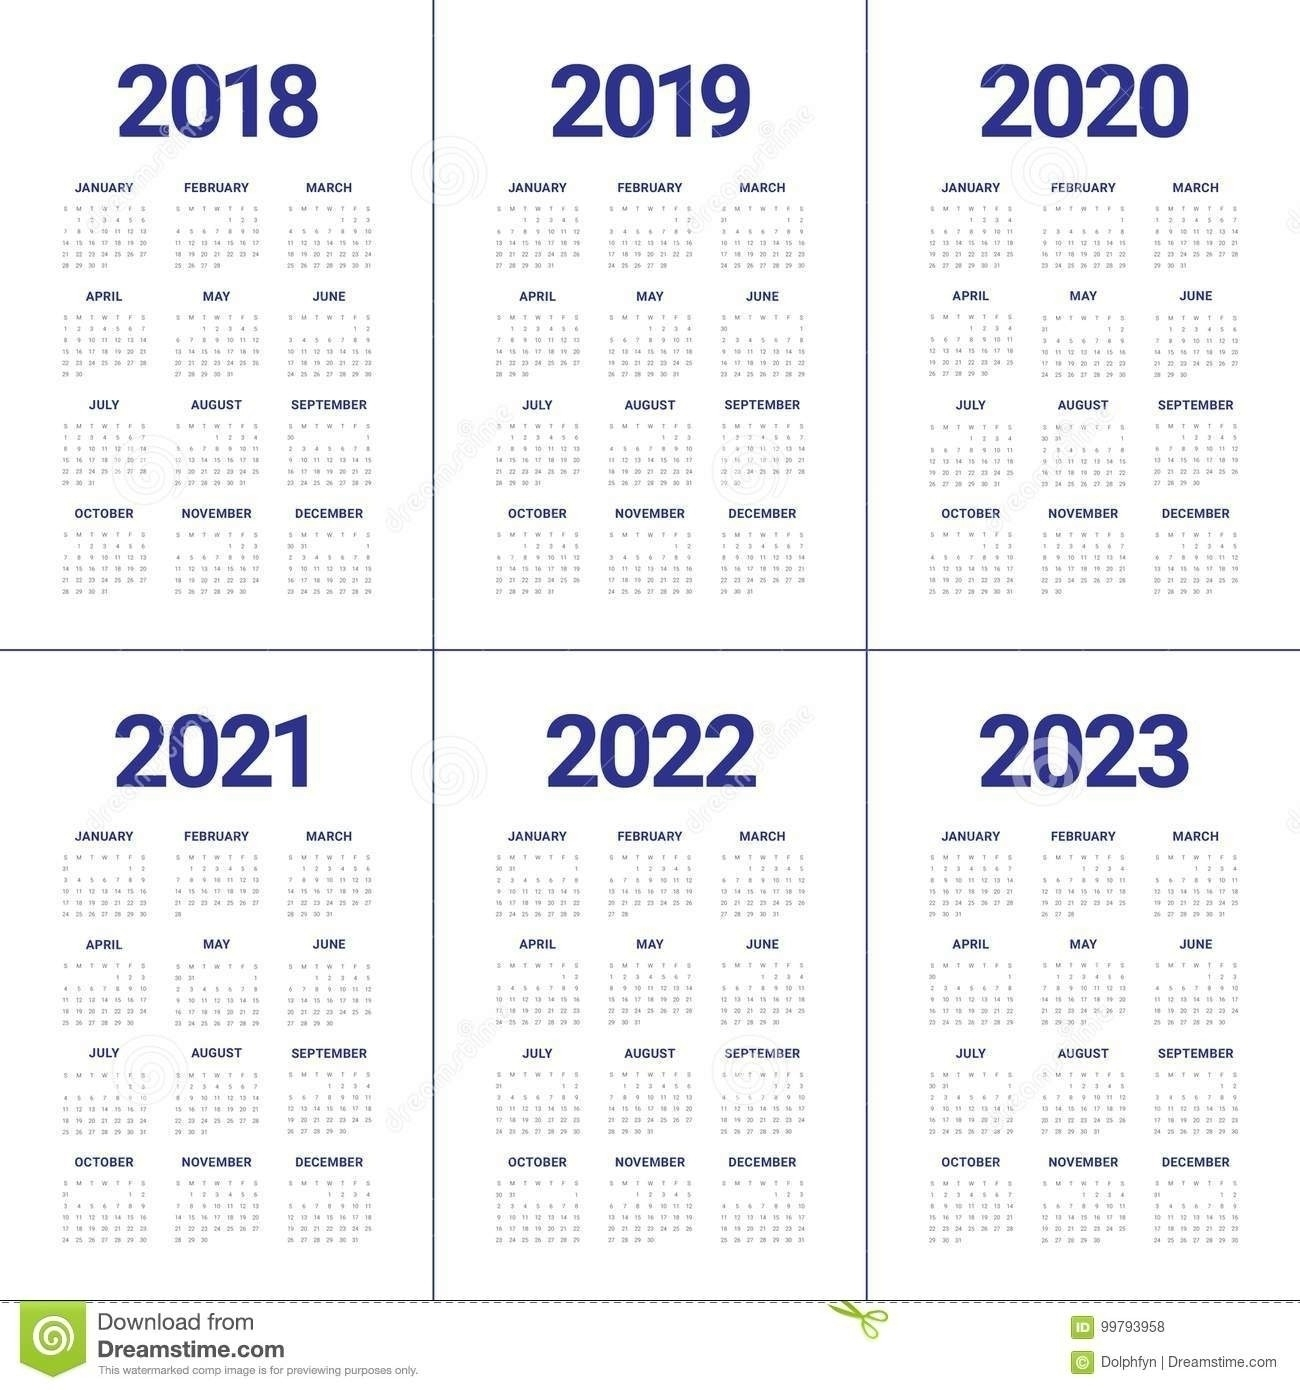 Pick 3 Year Calendar Printable 2021 2021 2022